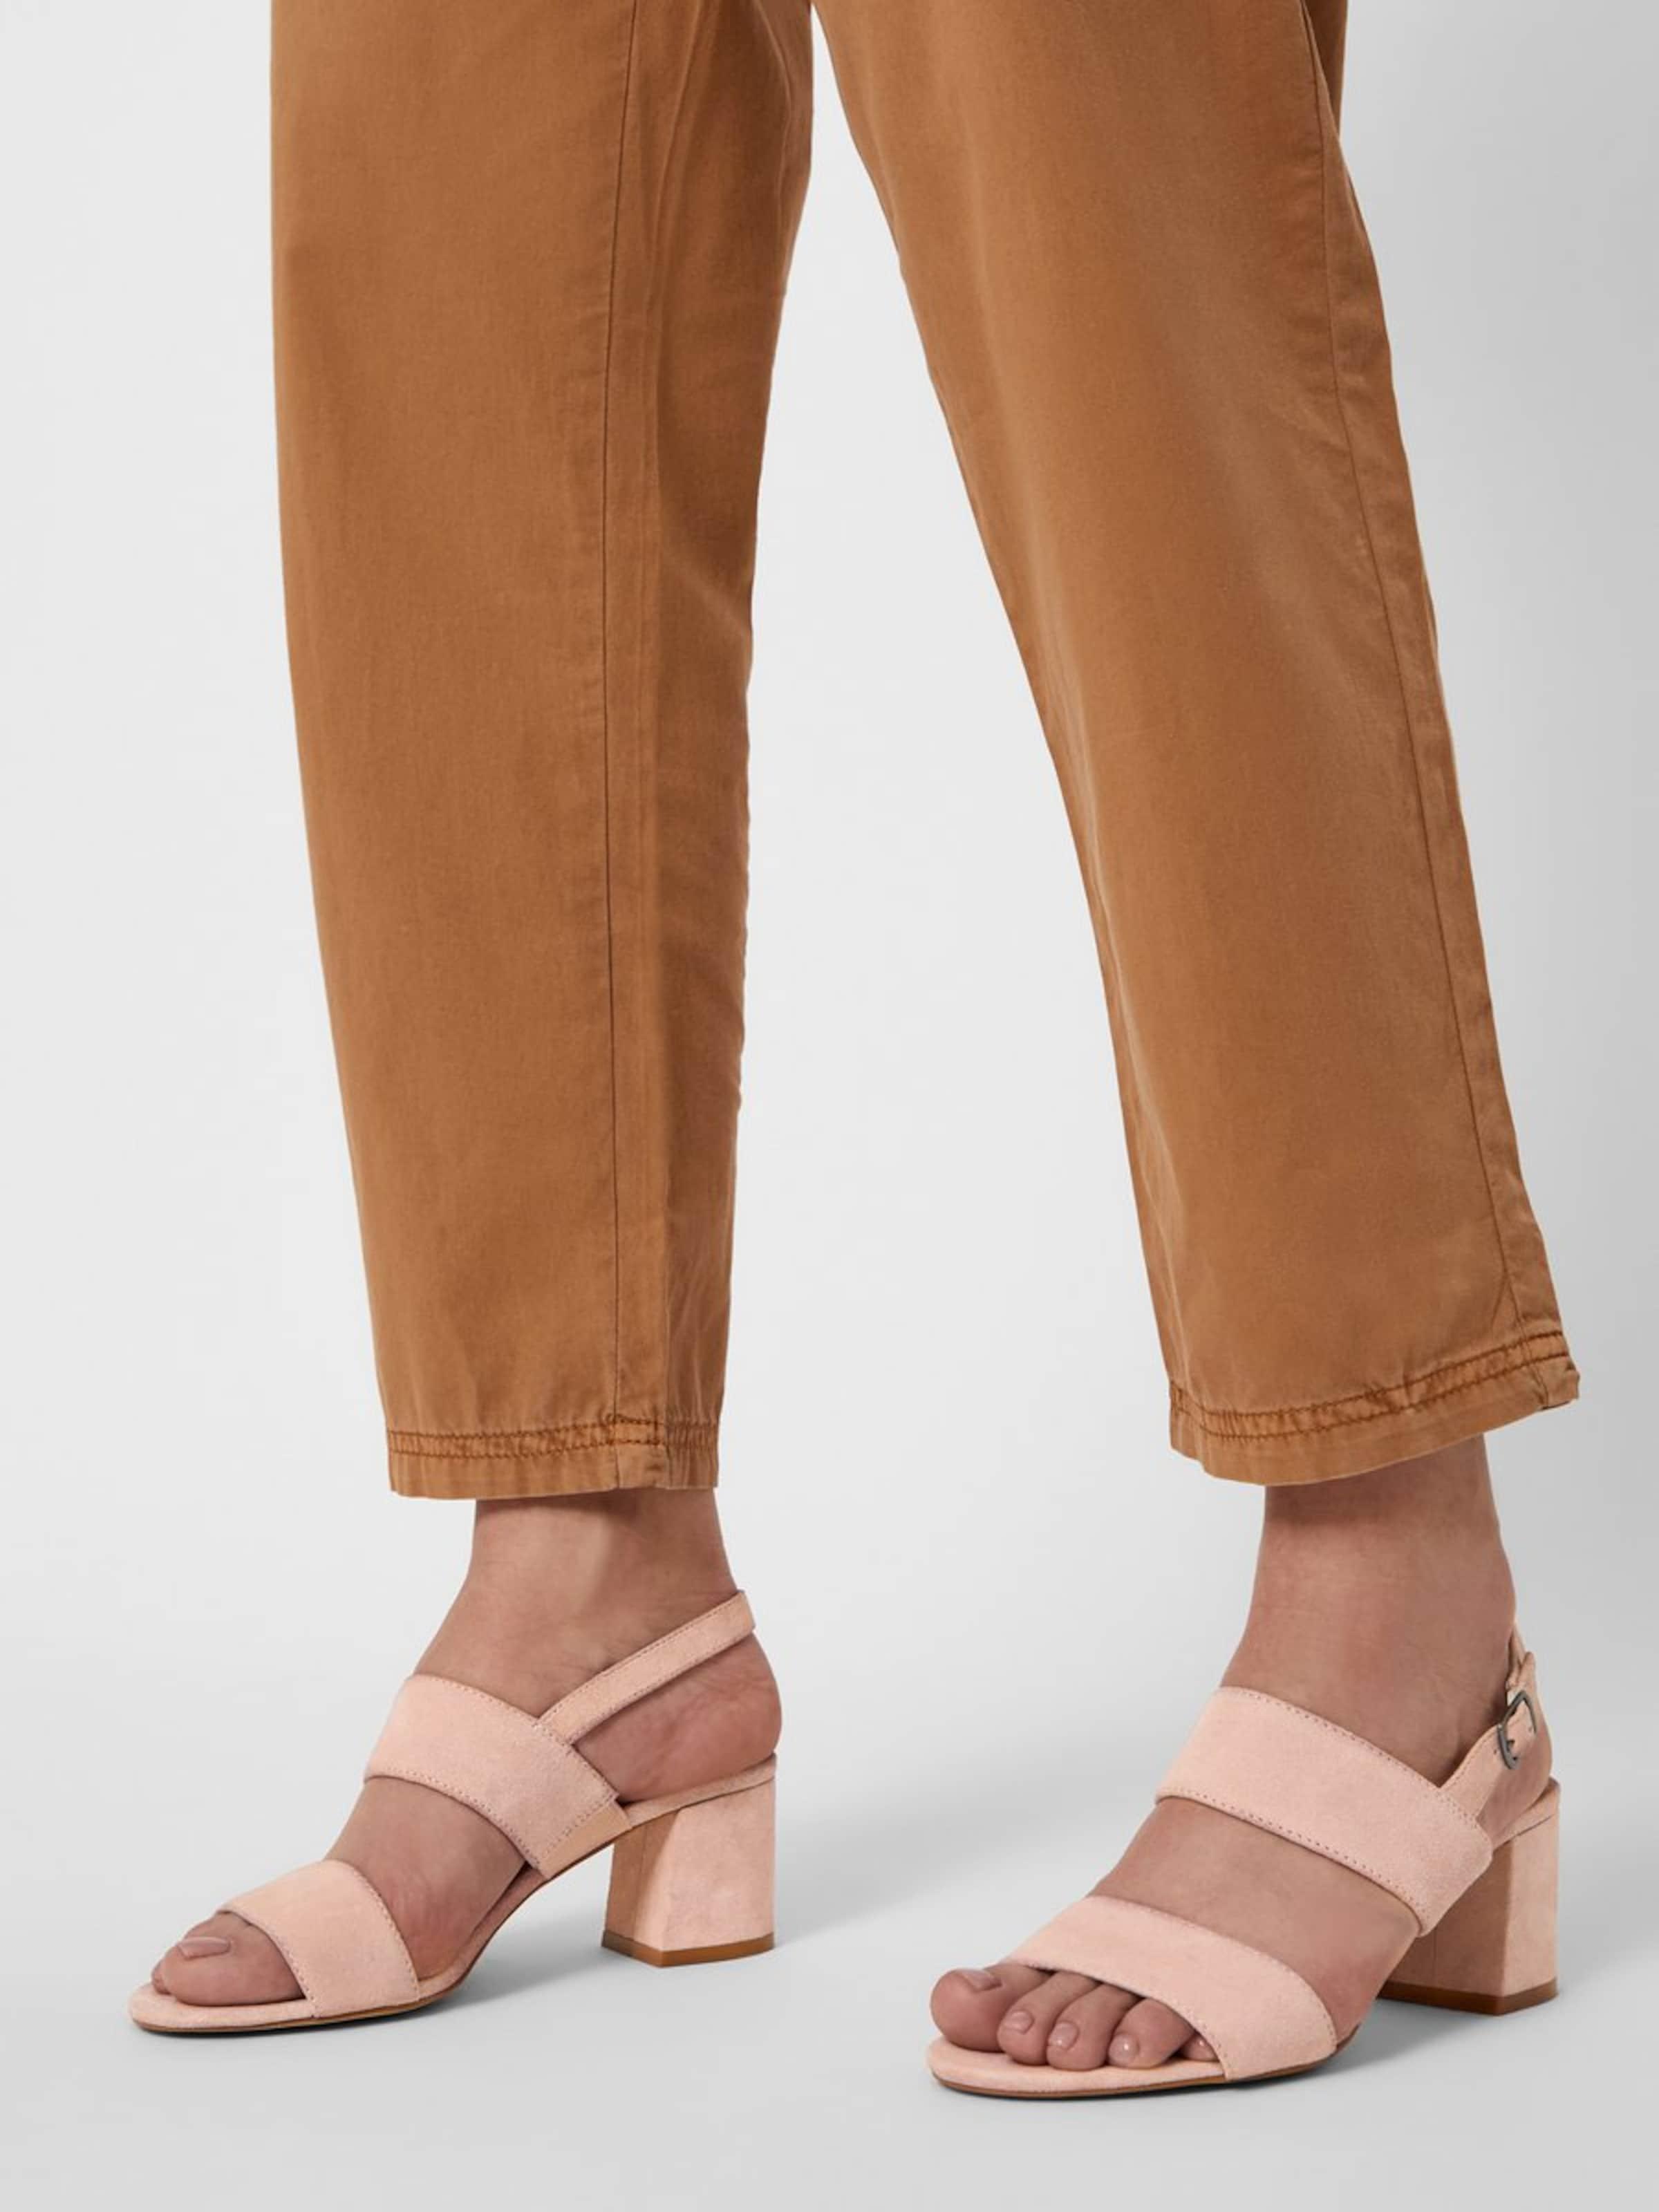 In Bianco Sandale Hellpink Hellpink Sandale In Bianco Sandale Hellpink Sandale In Bianco Bianco rodxBeWQCE